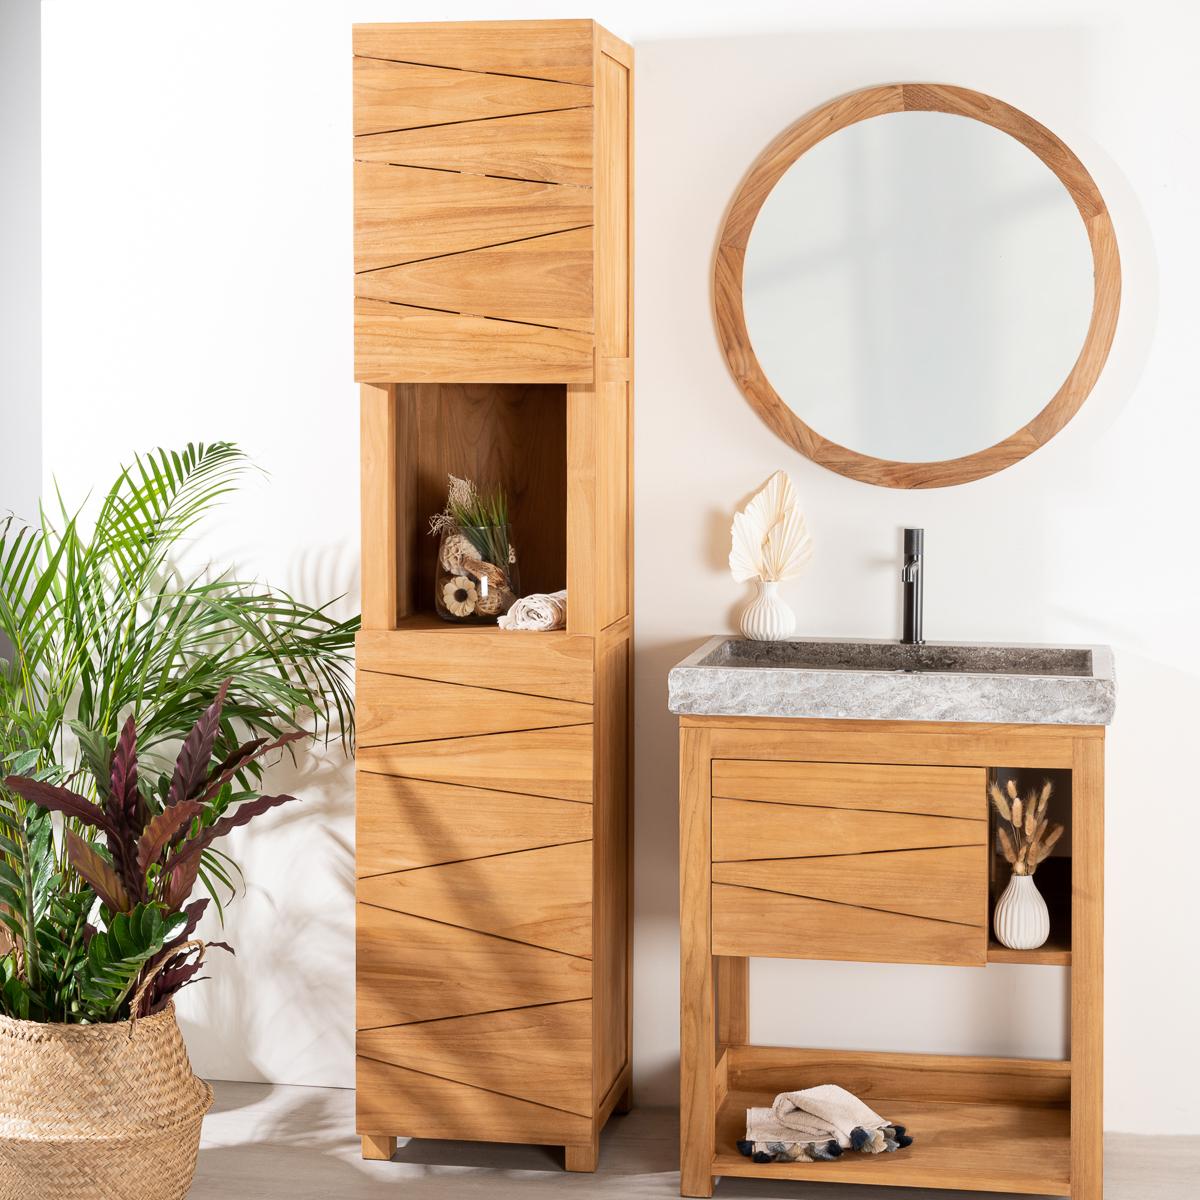 Colonne salle de bain en teck massif harmonie 190cm for Colonne salle de bain originale